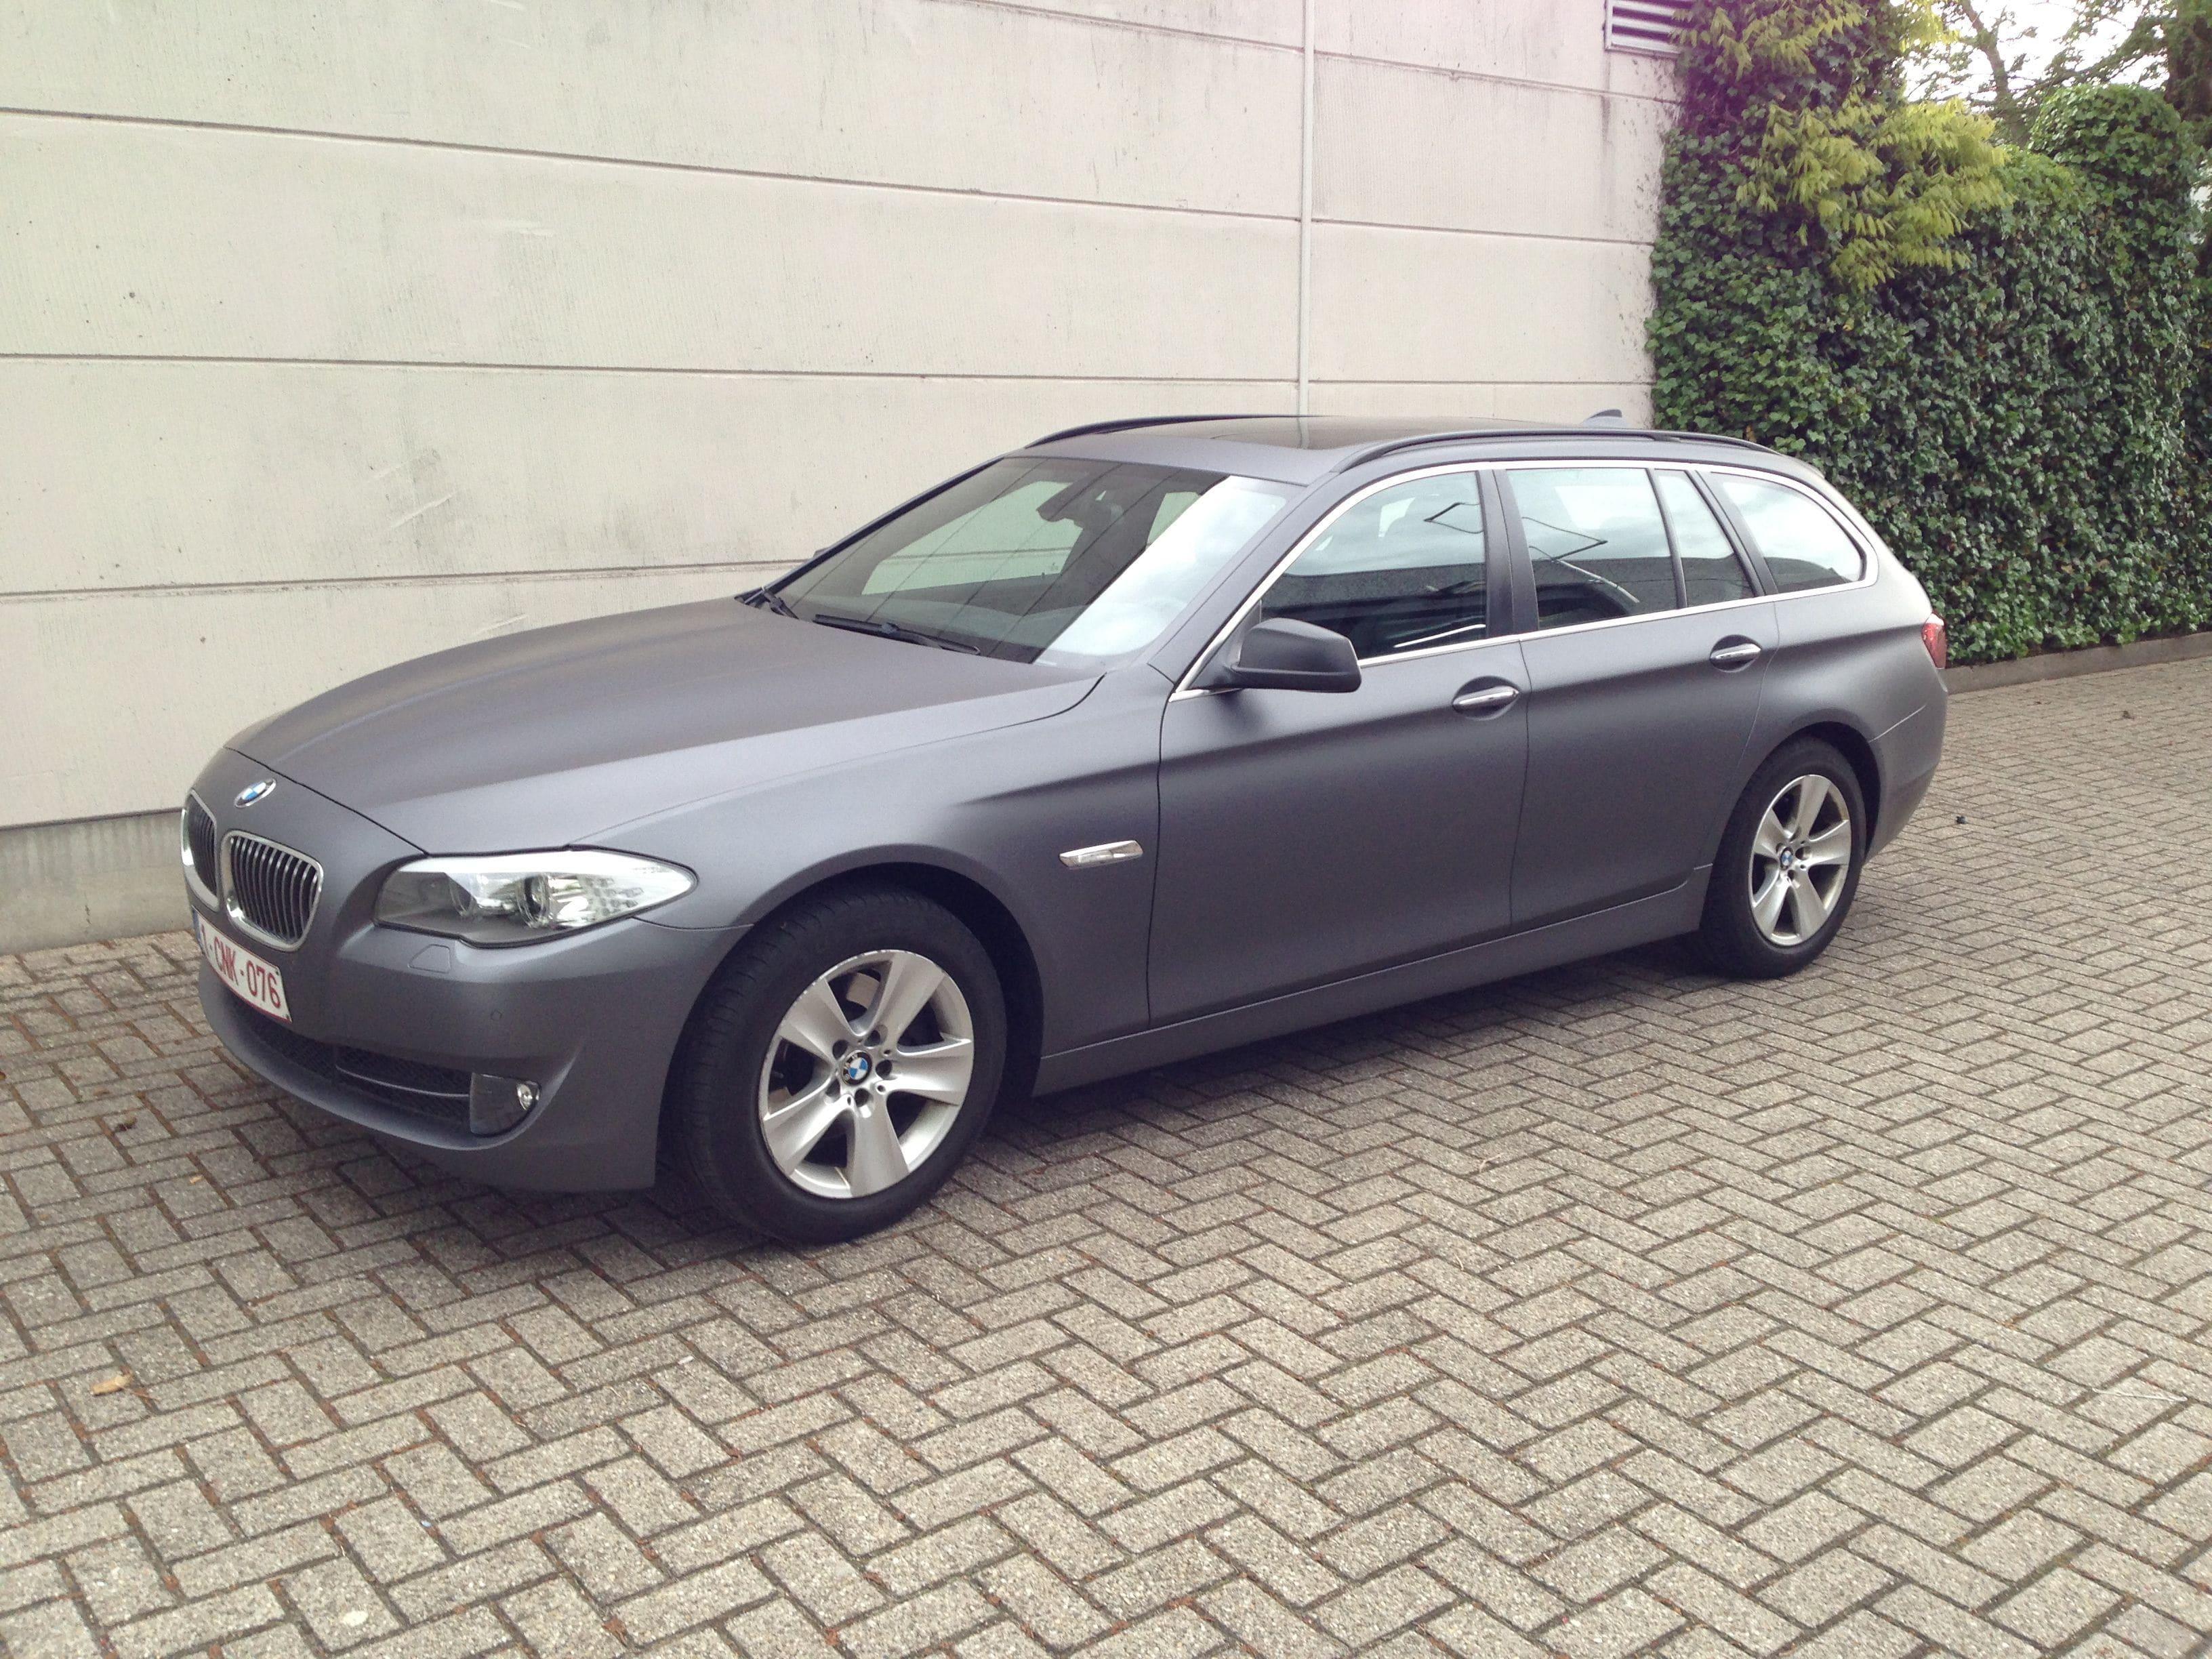 BMW 5 Serie met Gunpowder Wrap, Carwrapping door Wrapmyride.nu Foto-nr:5259, ©2021